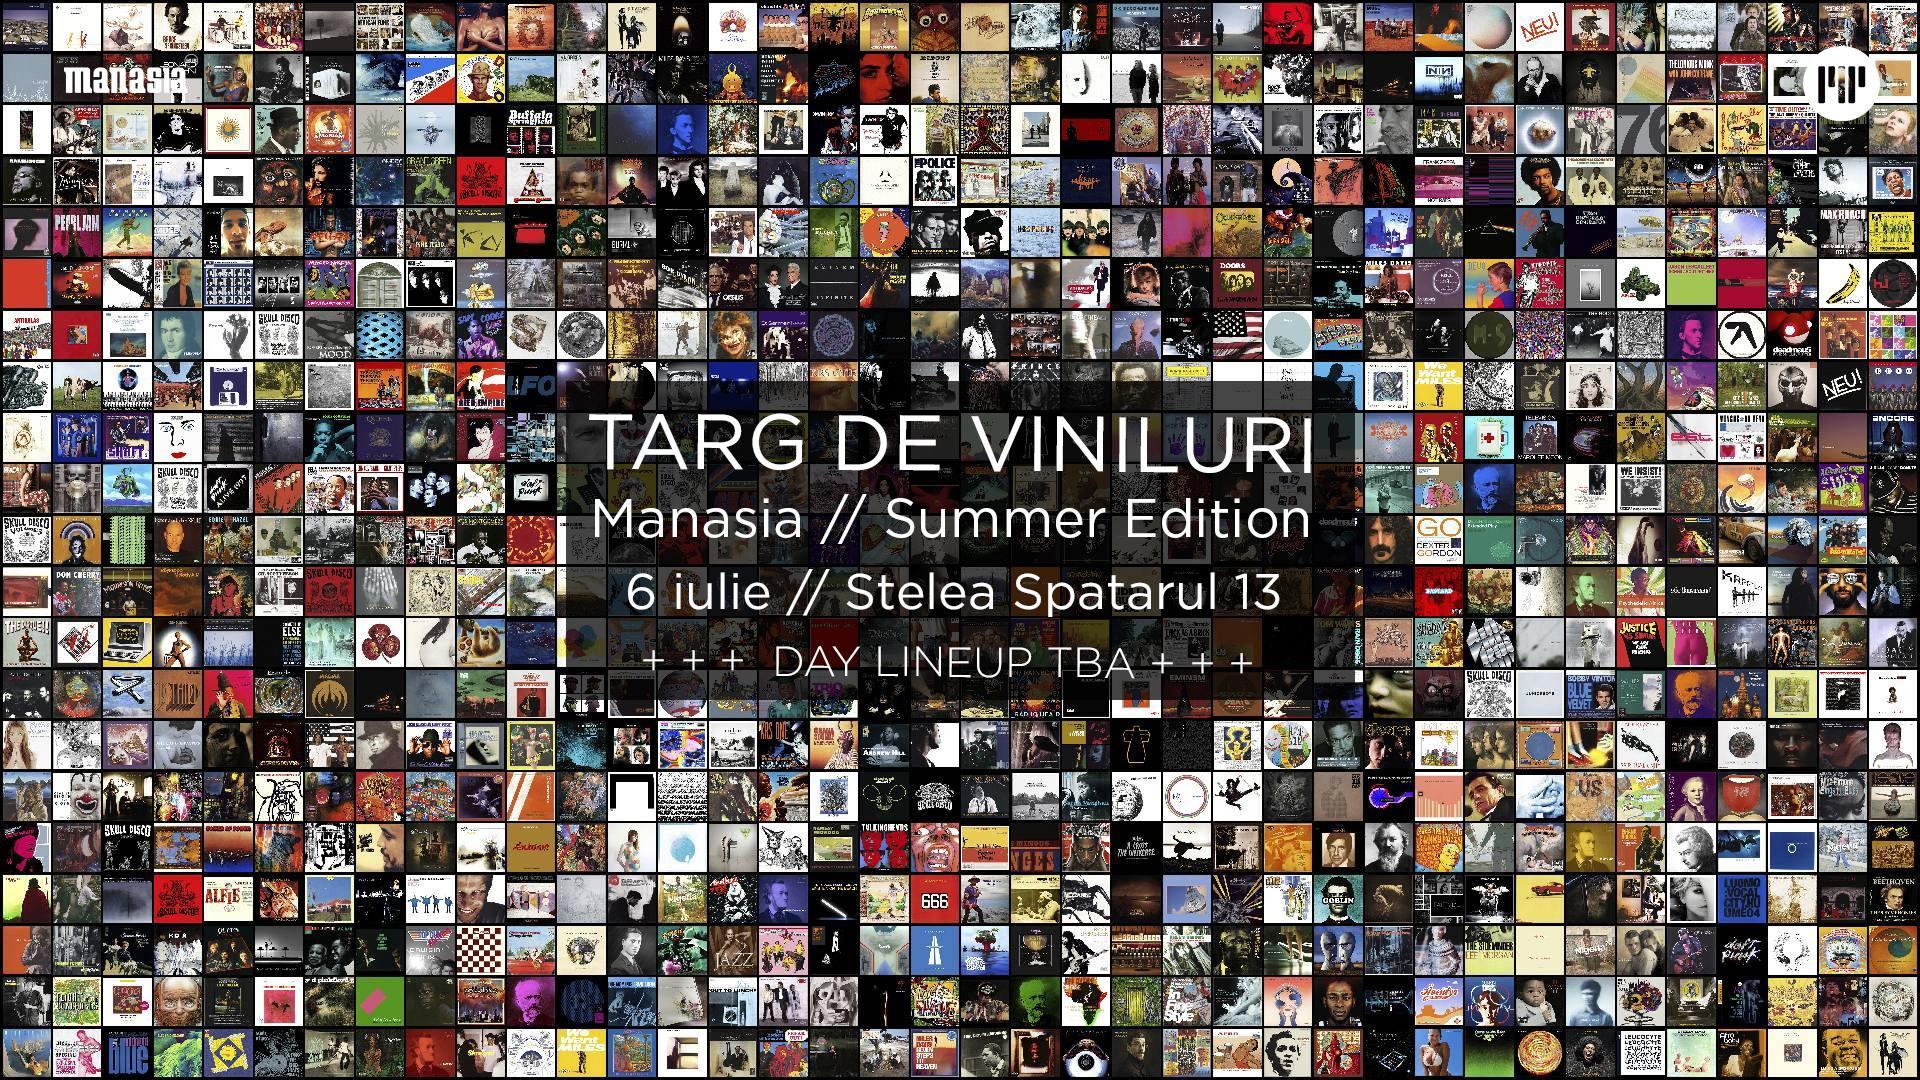 Targ de Viniluri @ Manasia // Summer Edition